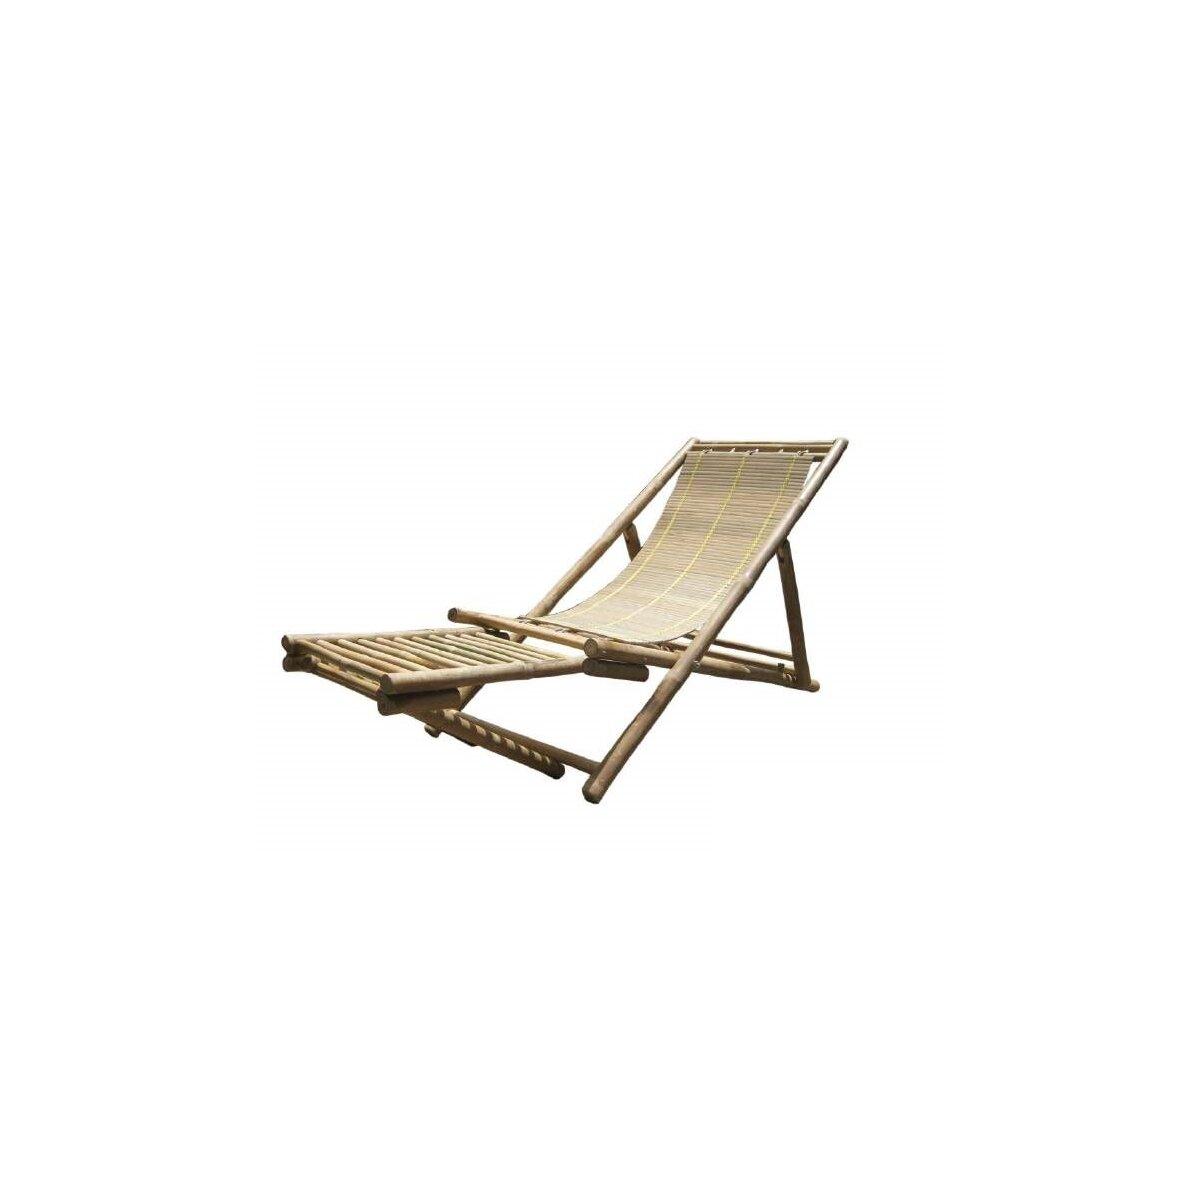 beach chair lounger gartenm bel liege chf. Black Bedroom Furniture Sets. Home Design Ideas